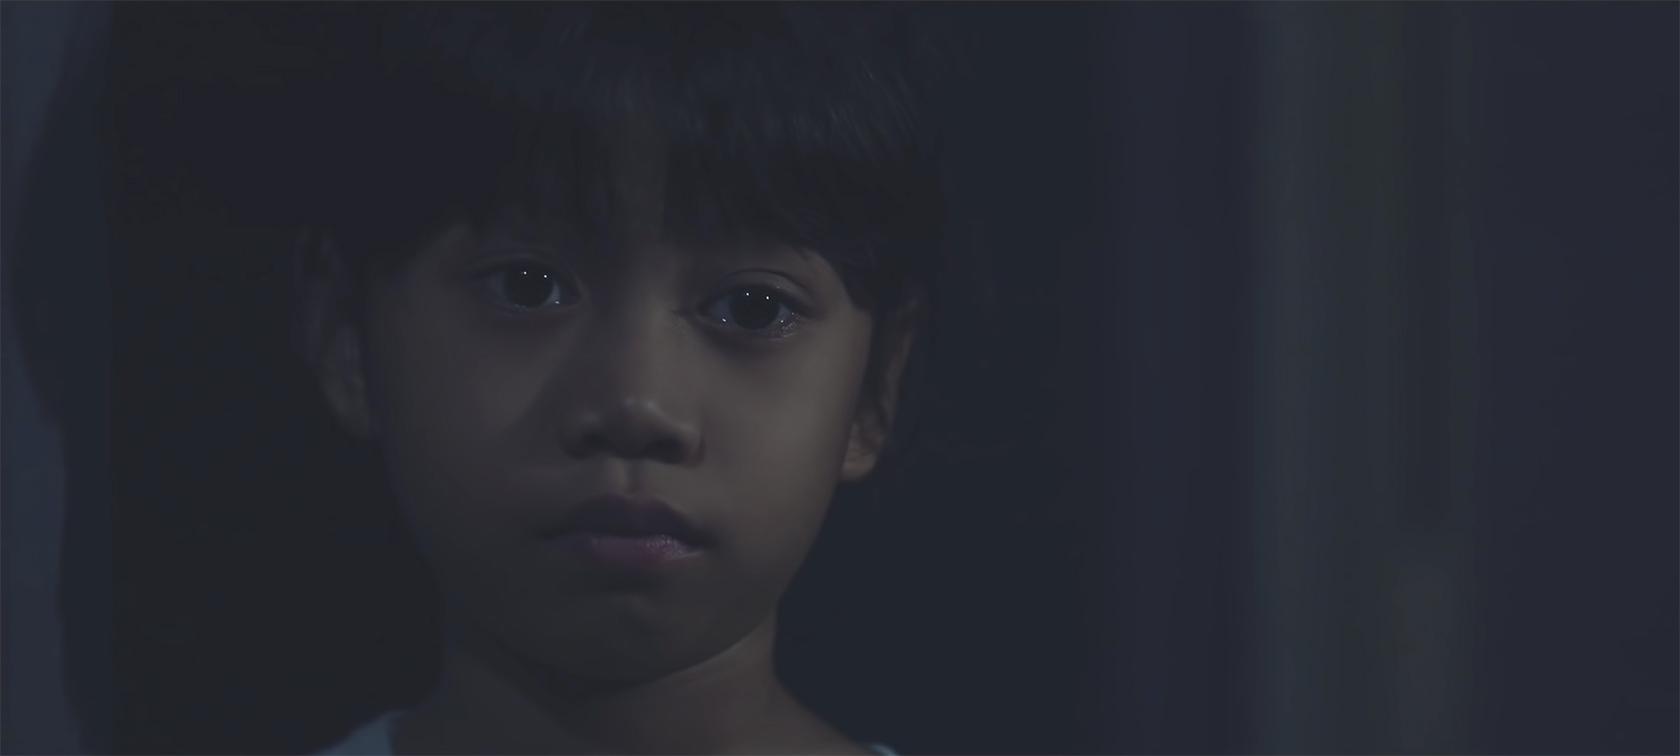 Naga DDB Tribal Malaysia creates Digi National Day film showing childrens' view of pandemic